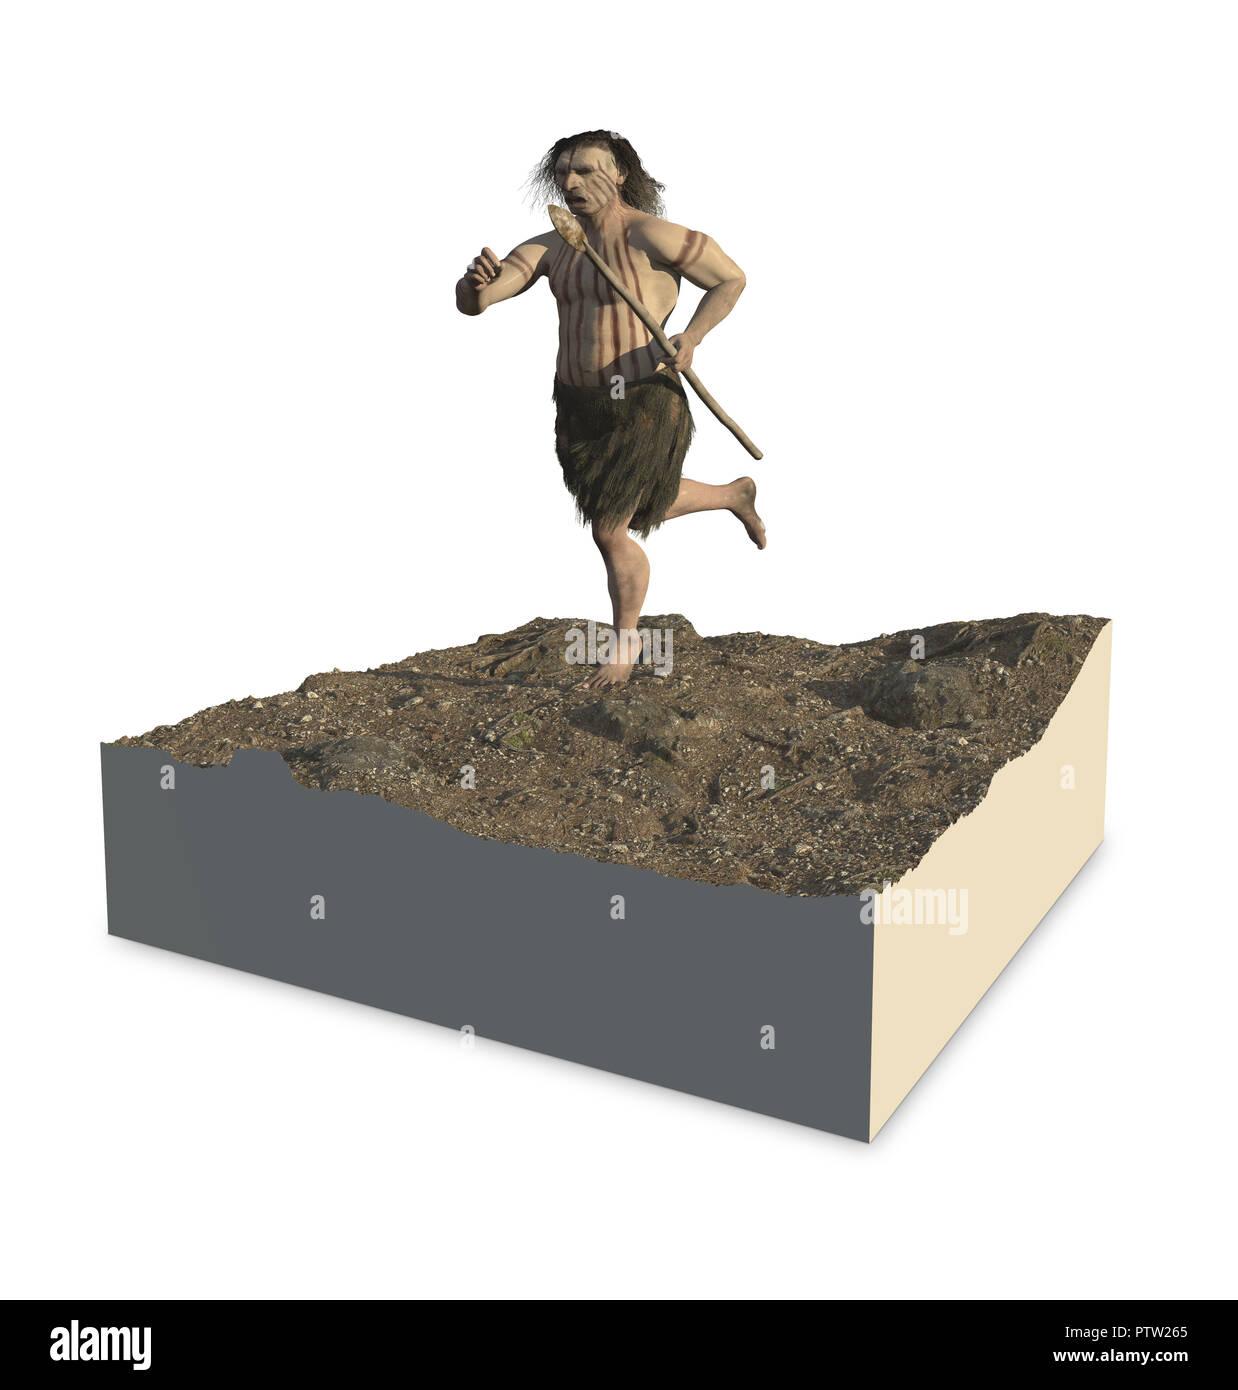 Digital illustration and 3d render of a Neandertal man - Stock Image